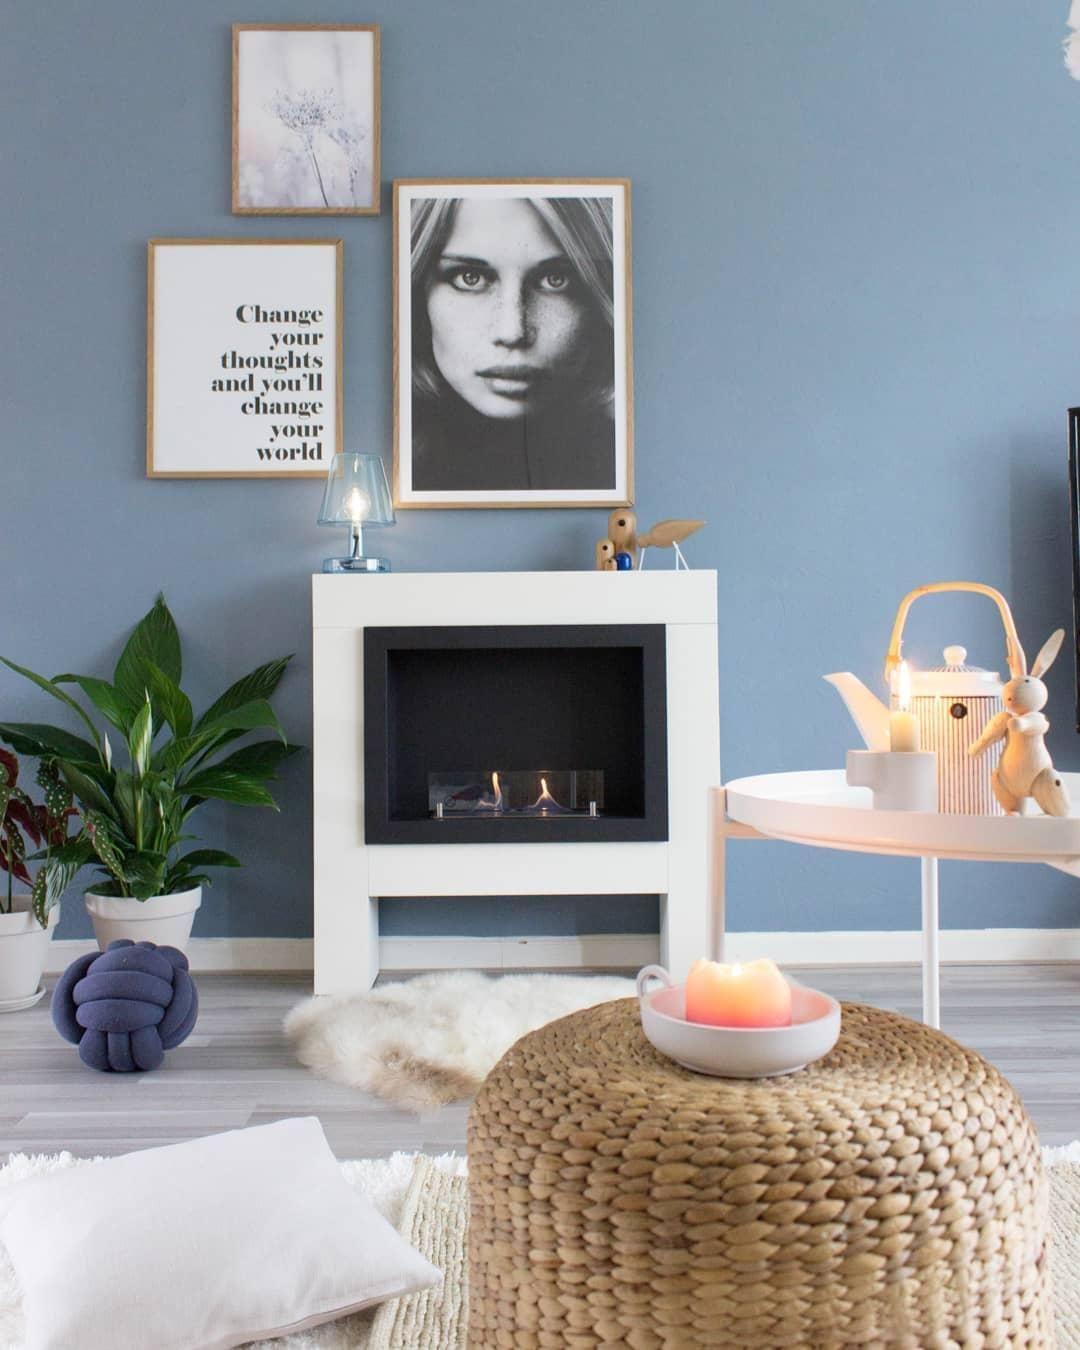 wandfarbe ruhe des nordens in 2019 let 39 s get cozy pinterest wandfarben ideen wohnzimmer. Black Bedroom Furniture Sets. Home Design Ideas